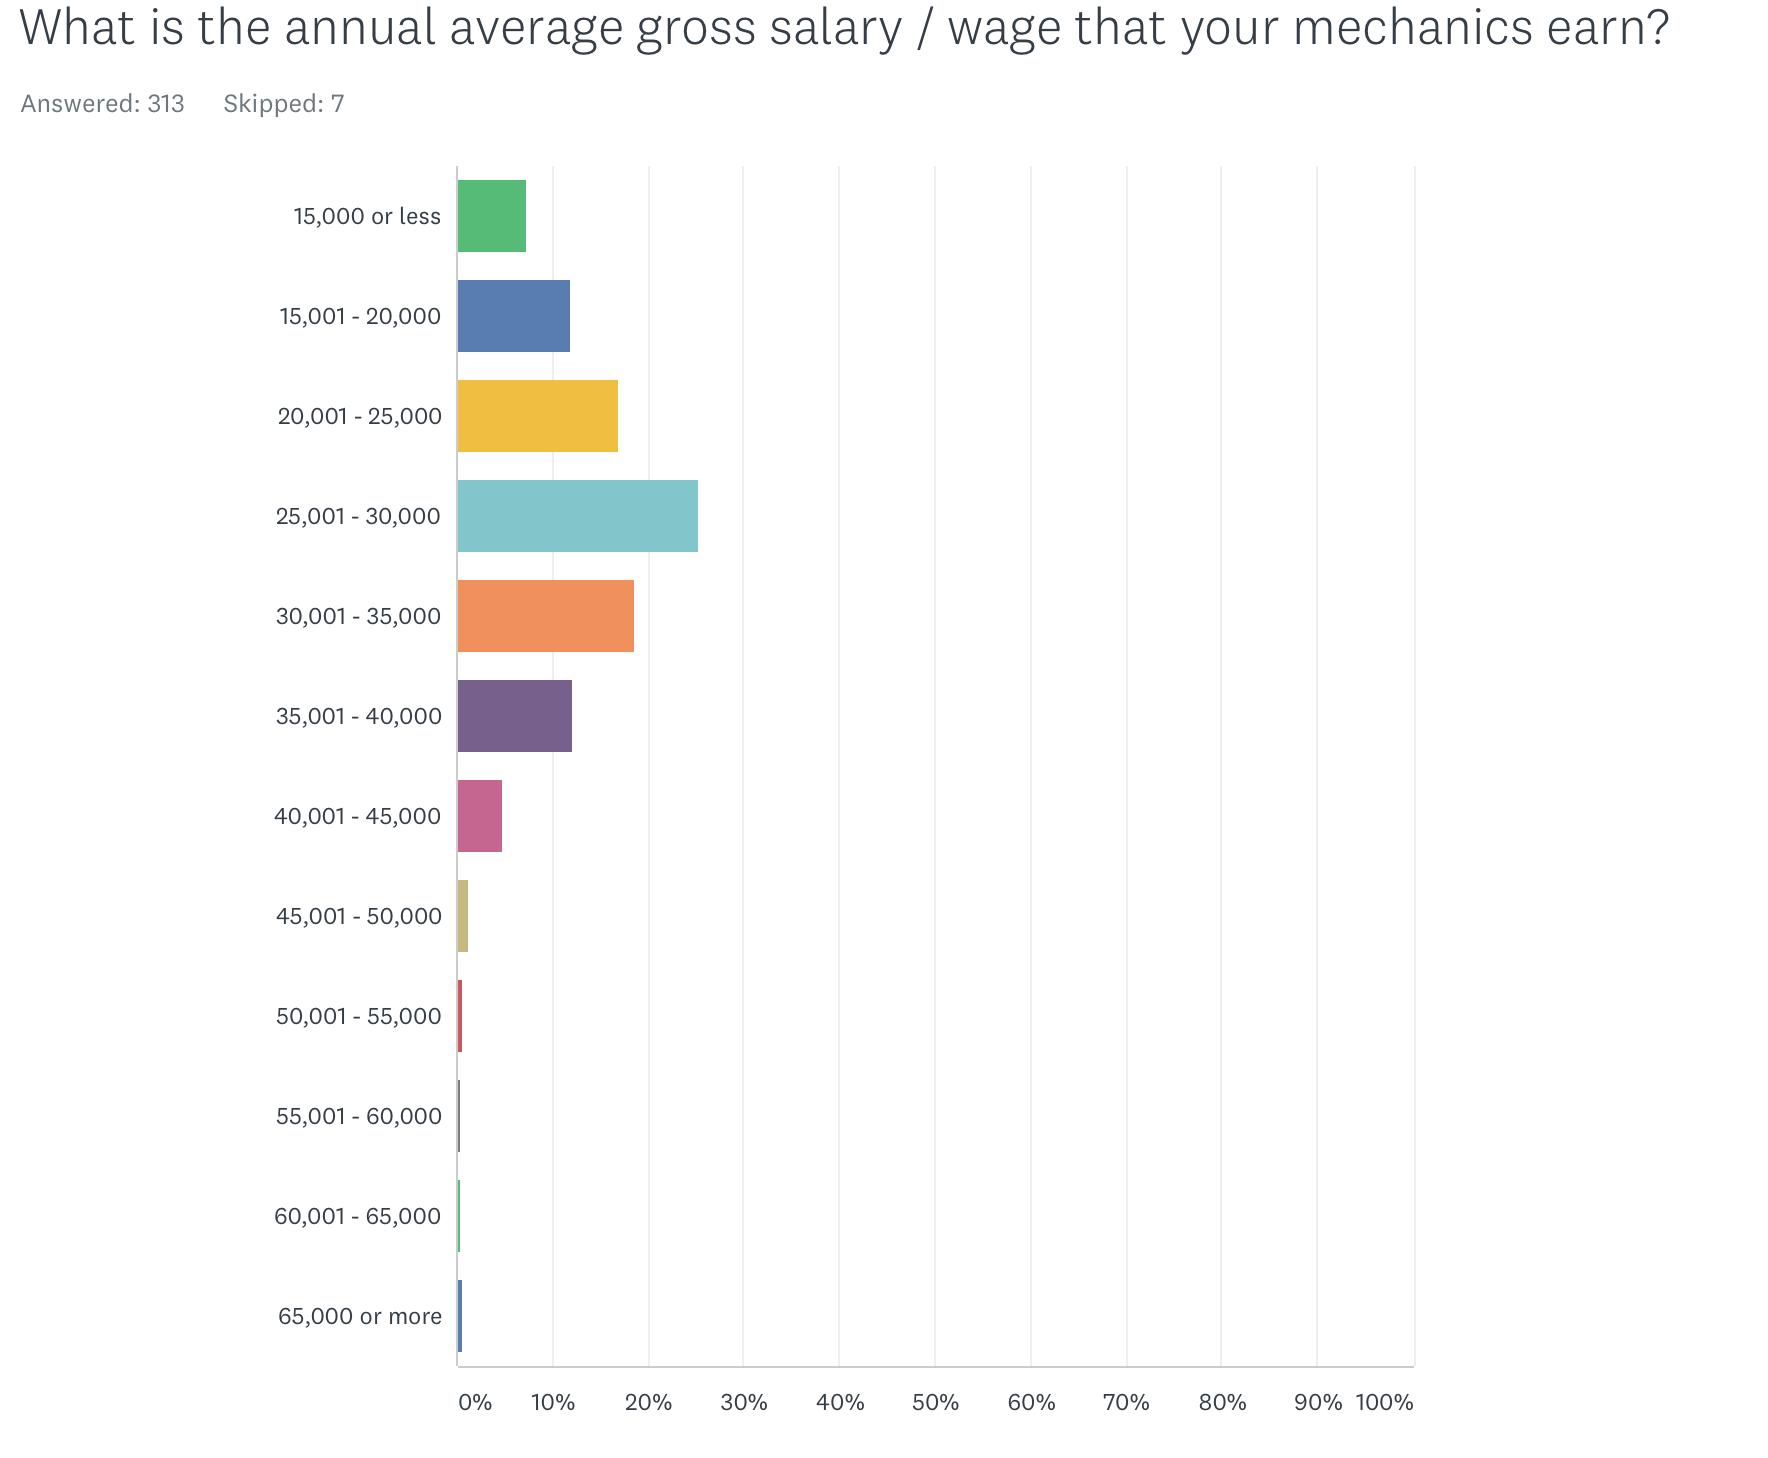 Annual mechanic salaries at bike shops. Source: 2018 PBMA survey.